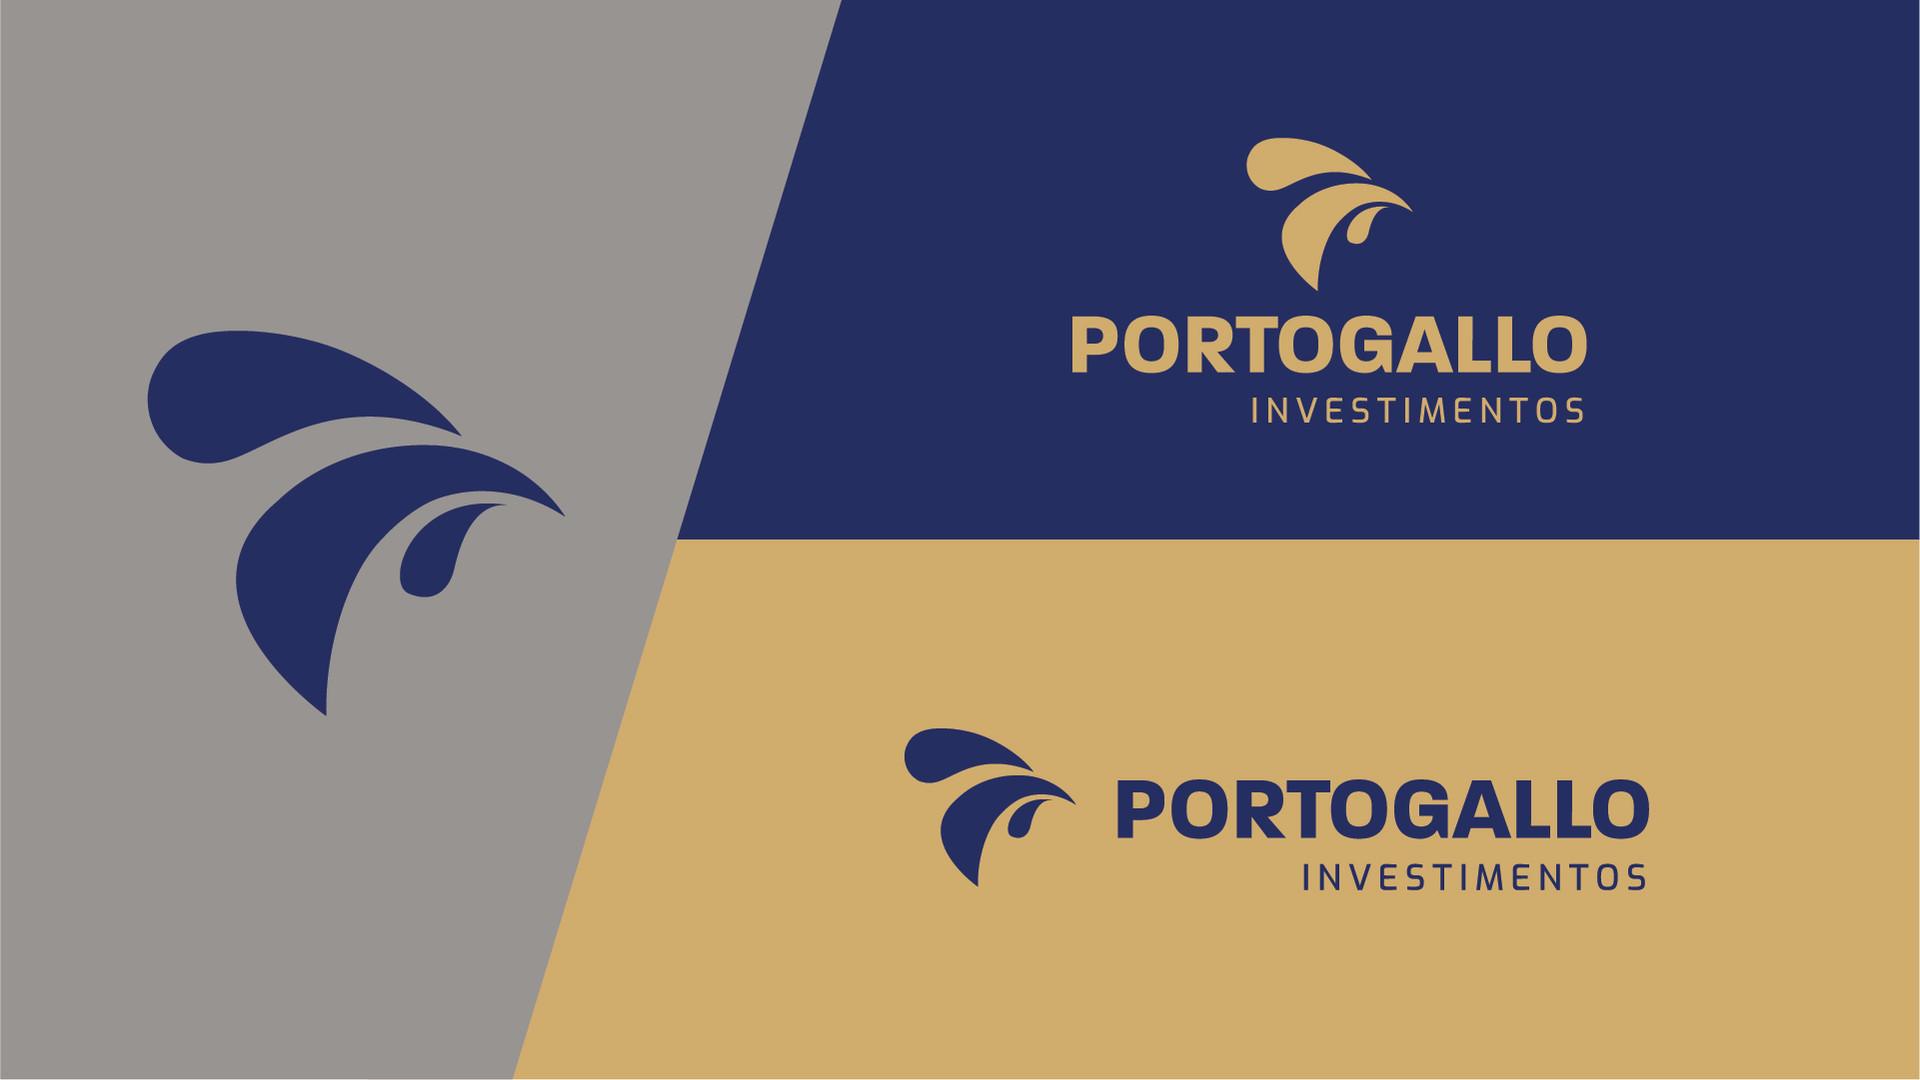 img-portfolio-portogallo-voadora (7).jpg